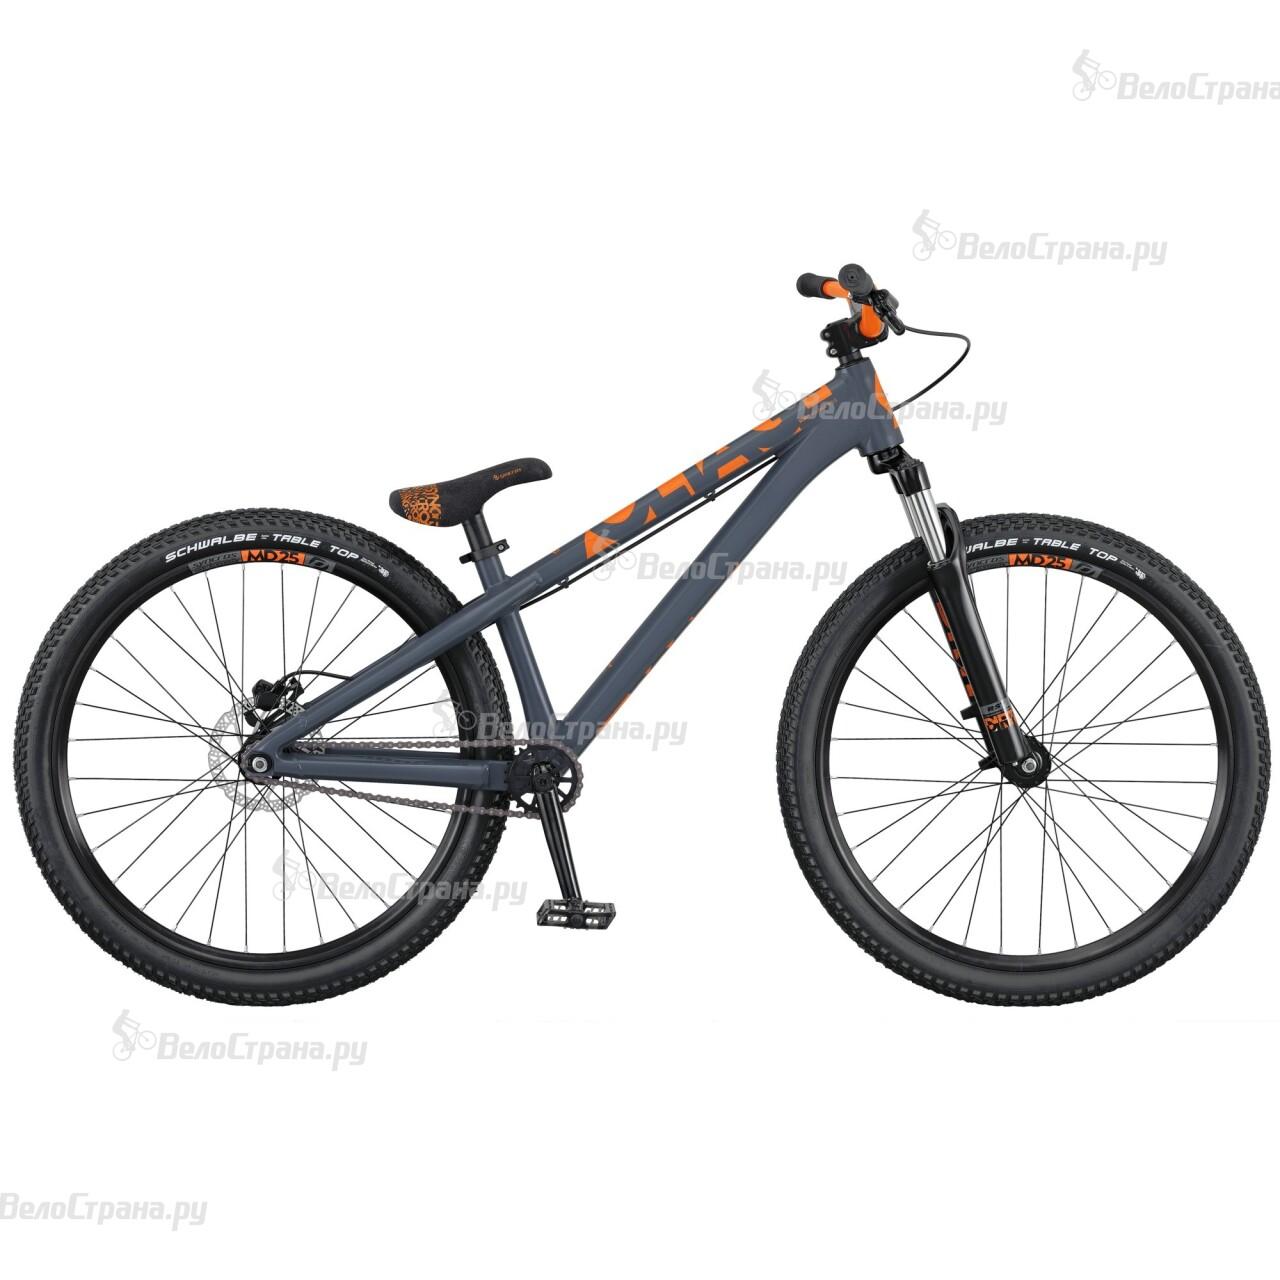 Велосипед Scott Voltage YZ 0.2 (2016)  цены